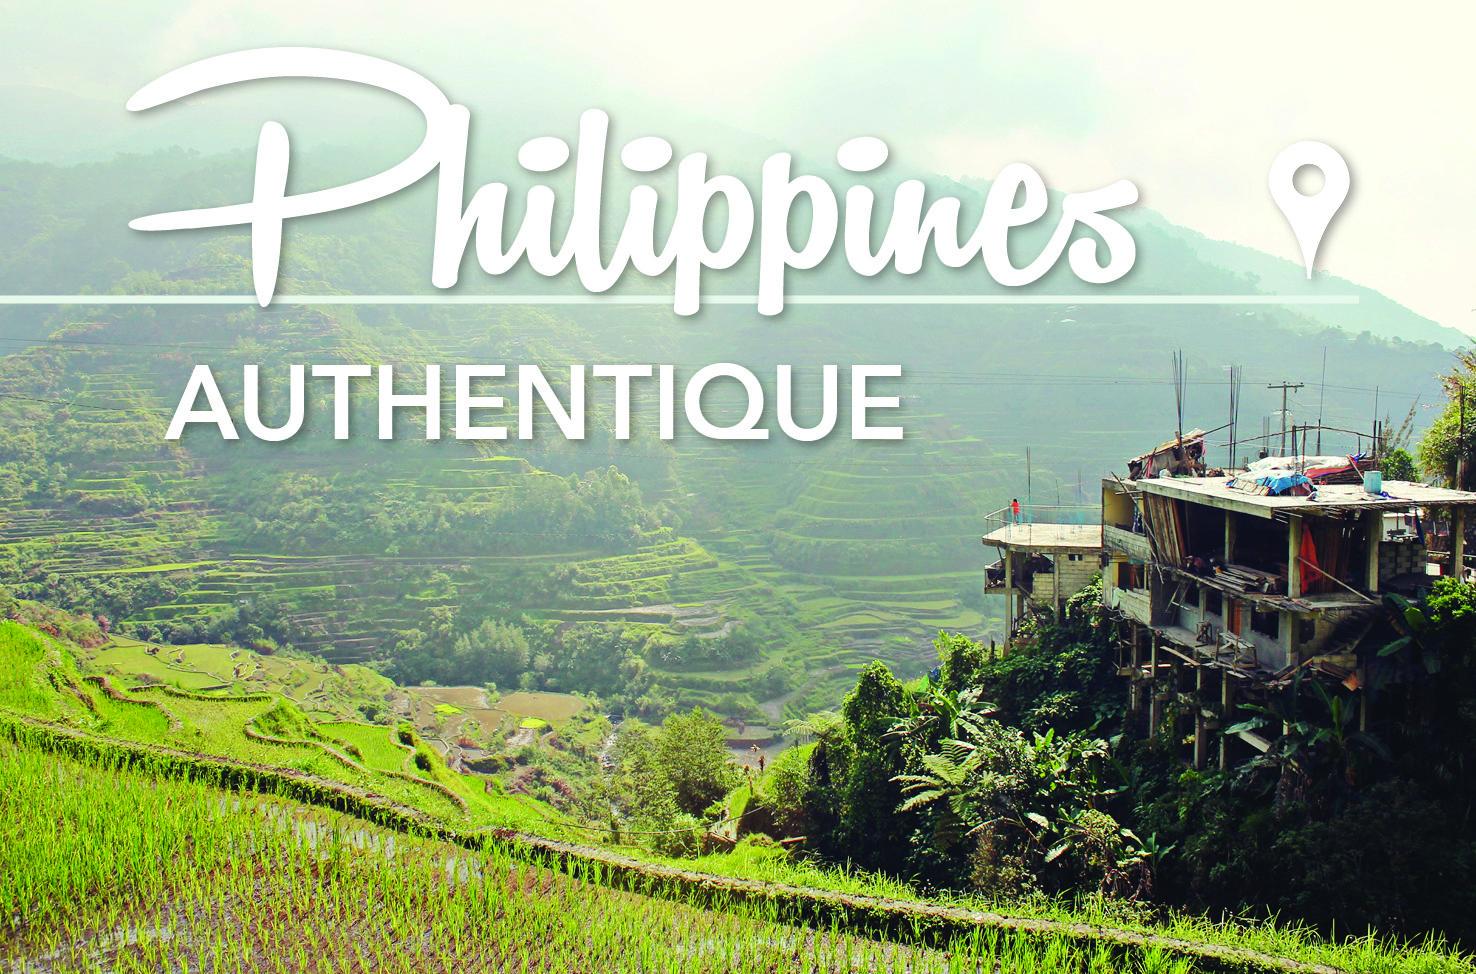 Philippines, Bohol, Lohay, Manille, voyage, Anda, Jagna, île, ile, Asie, Panglao, rizières